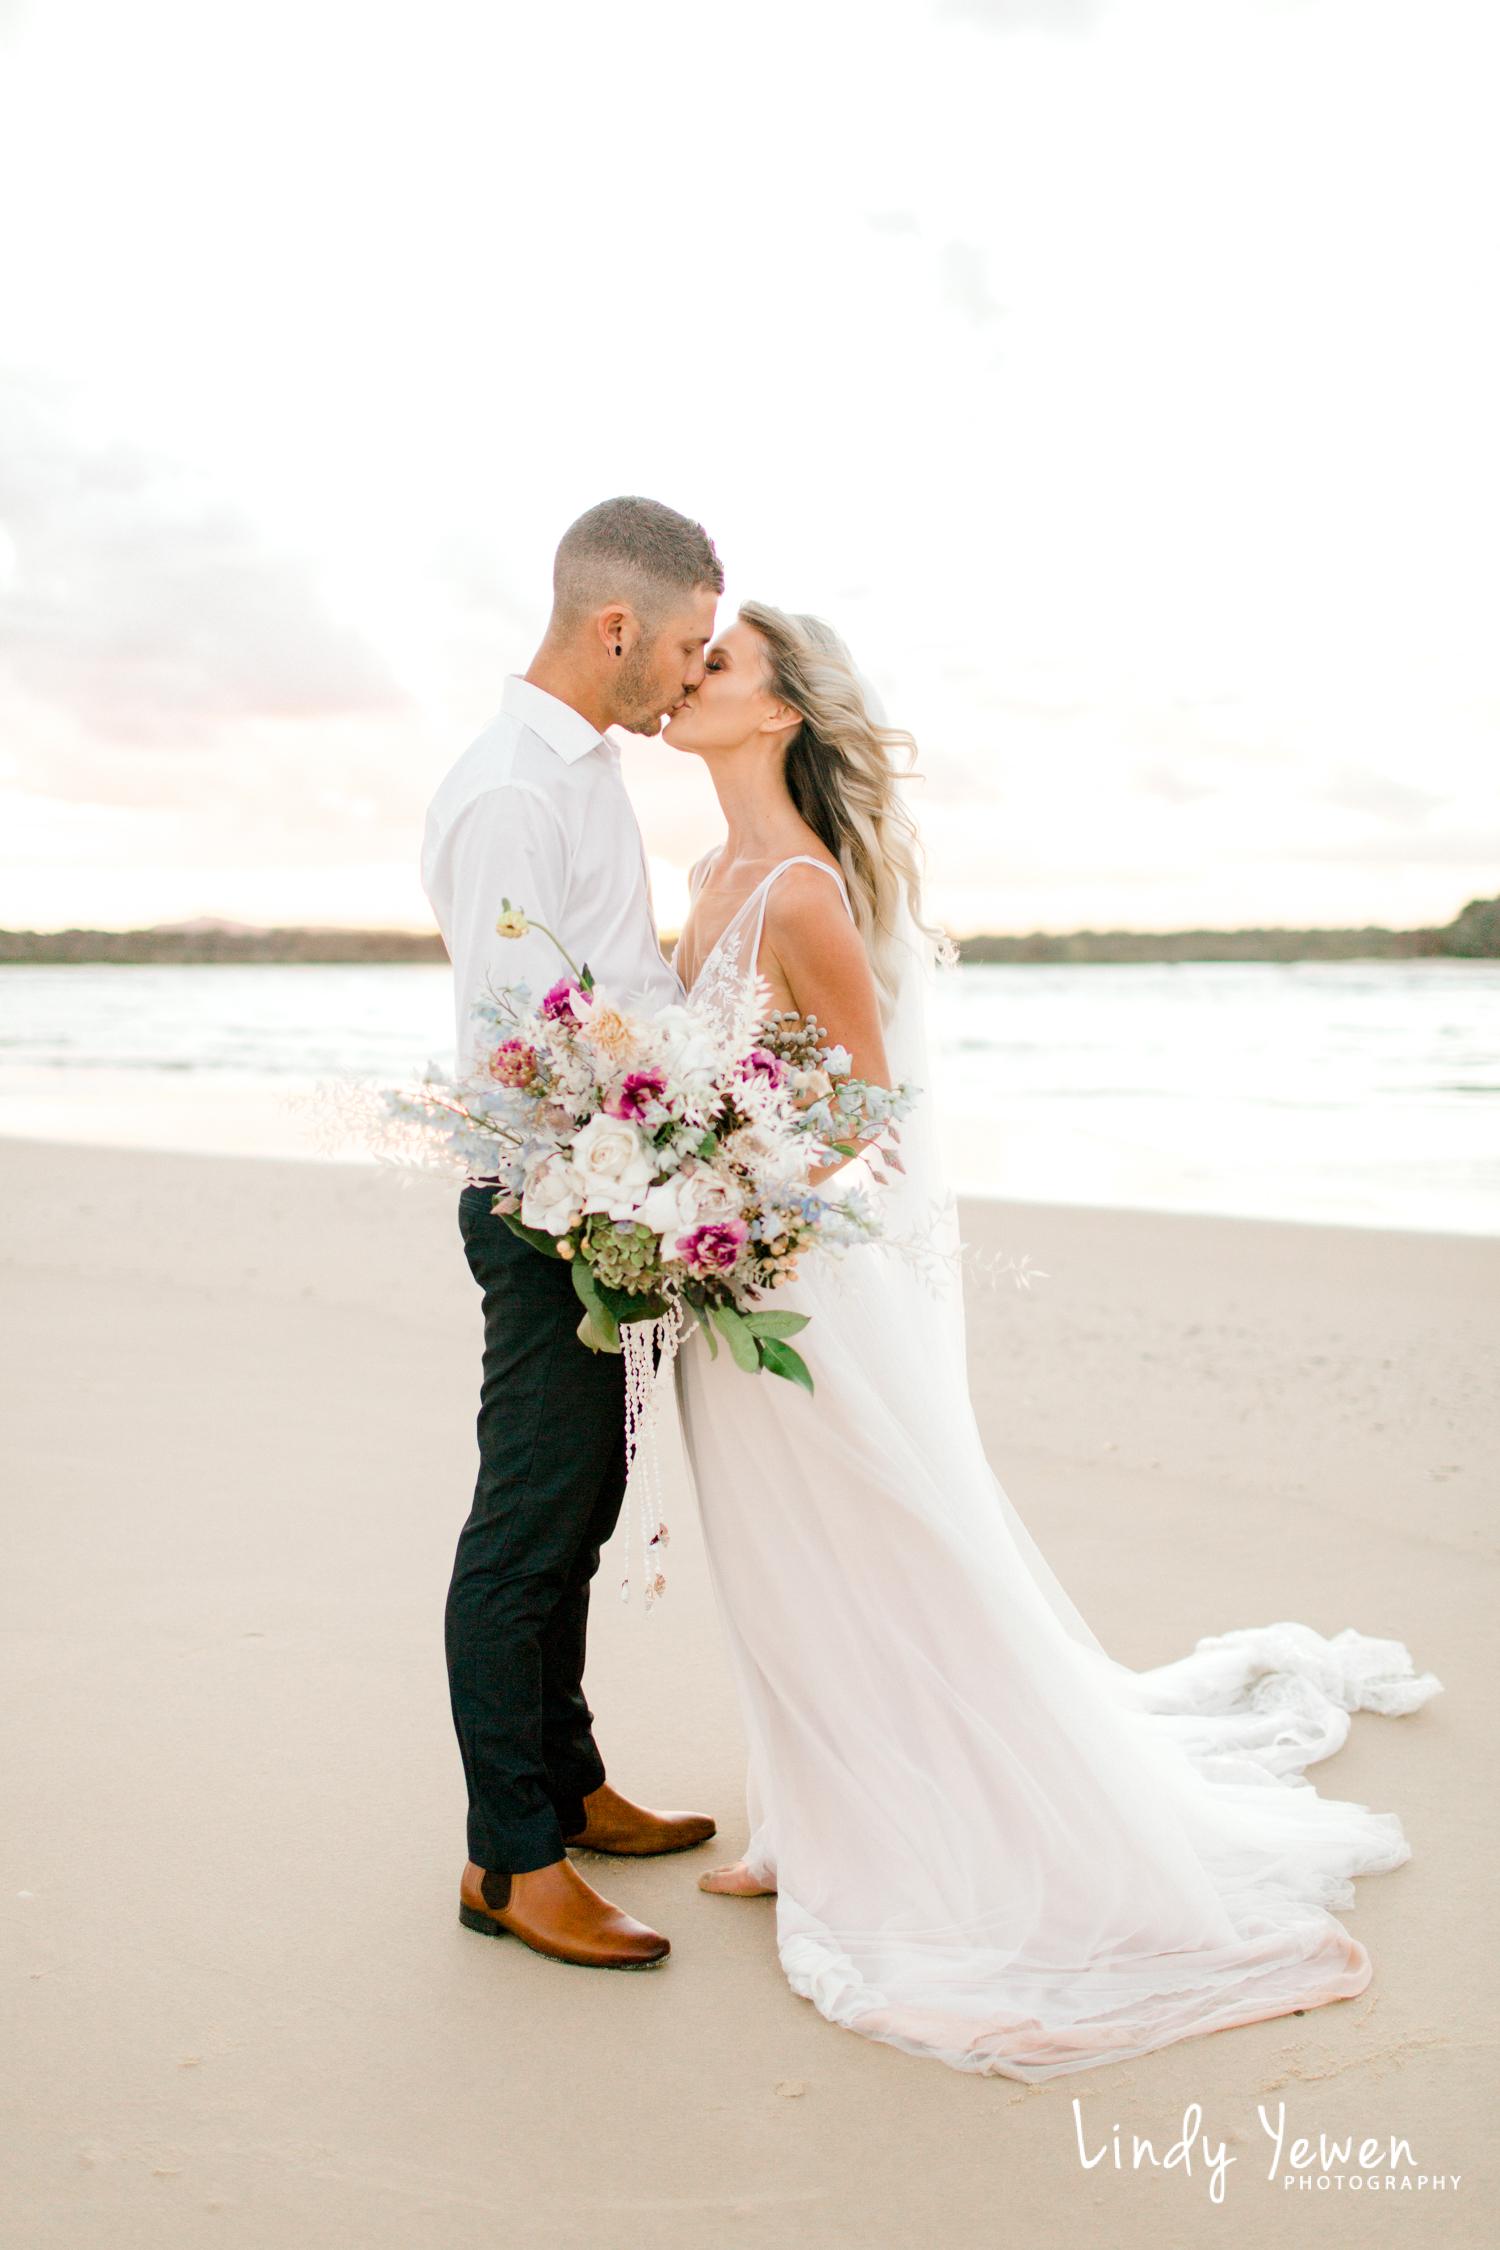 Lindy-Photography-Noosa-Weddings-Grace-Chris 288.jpg